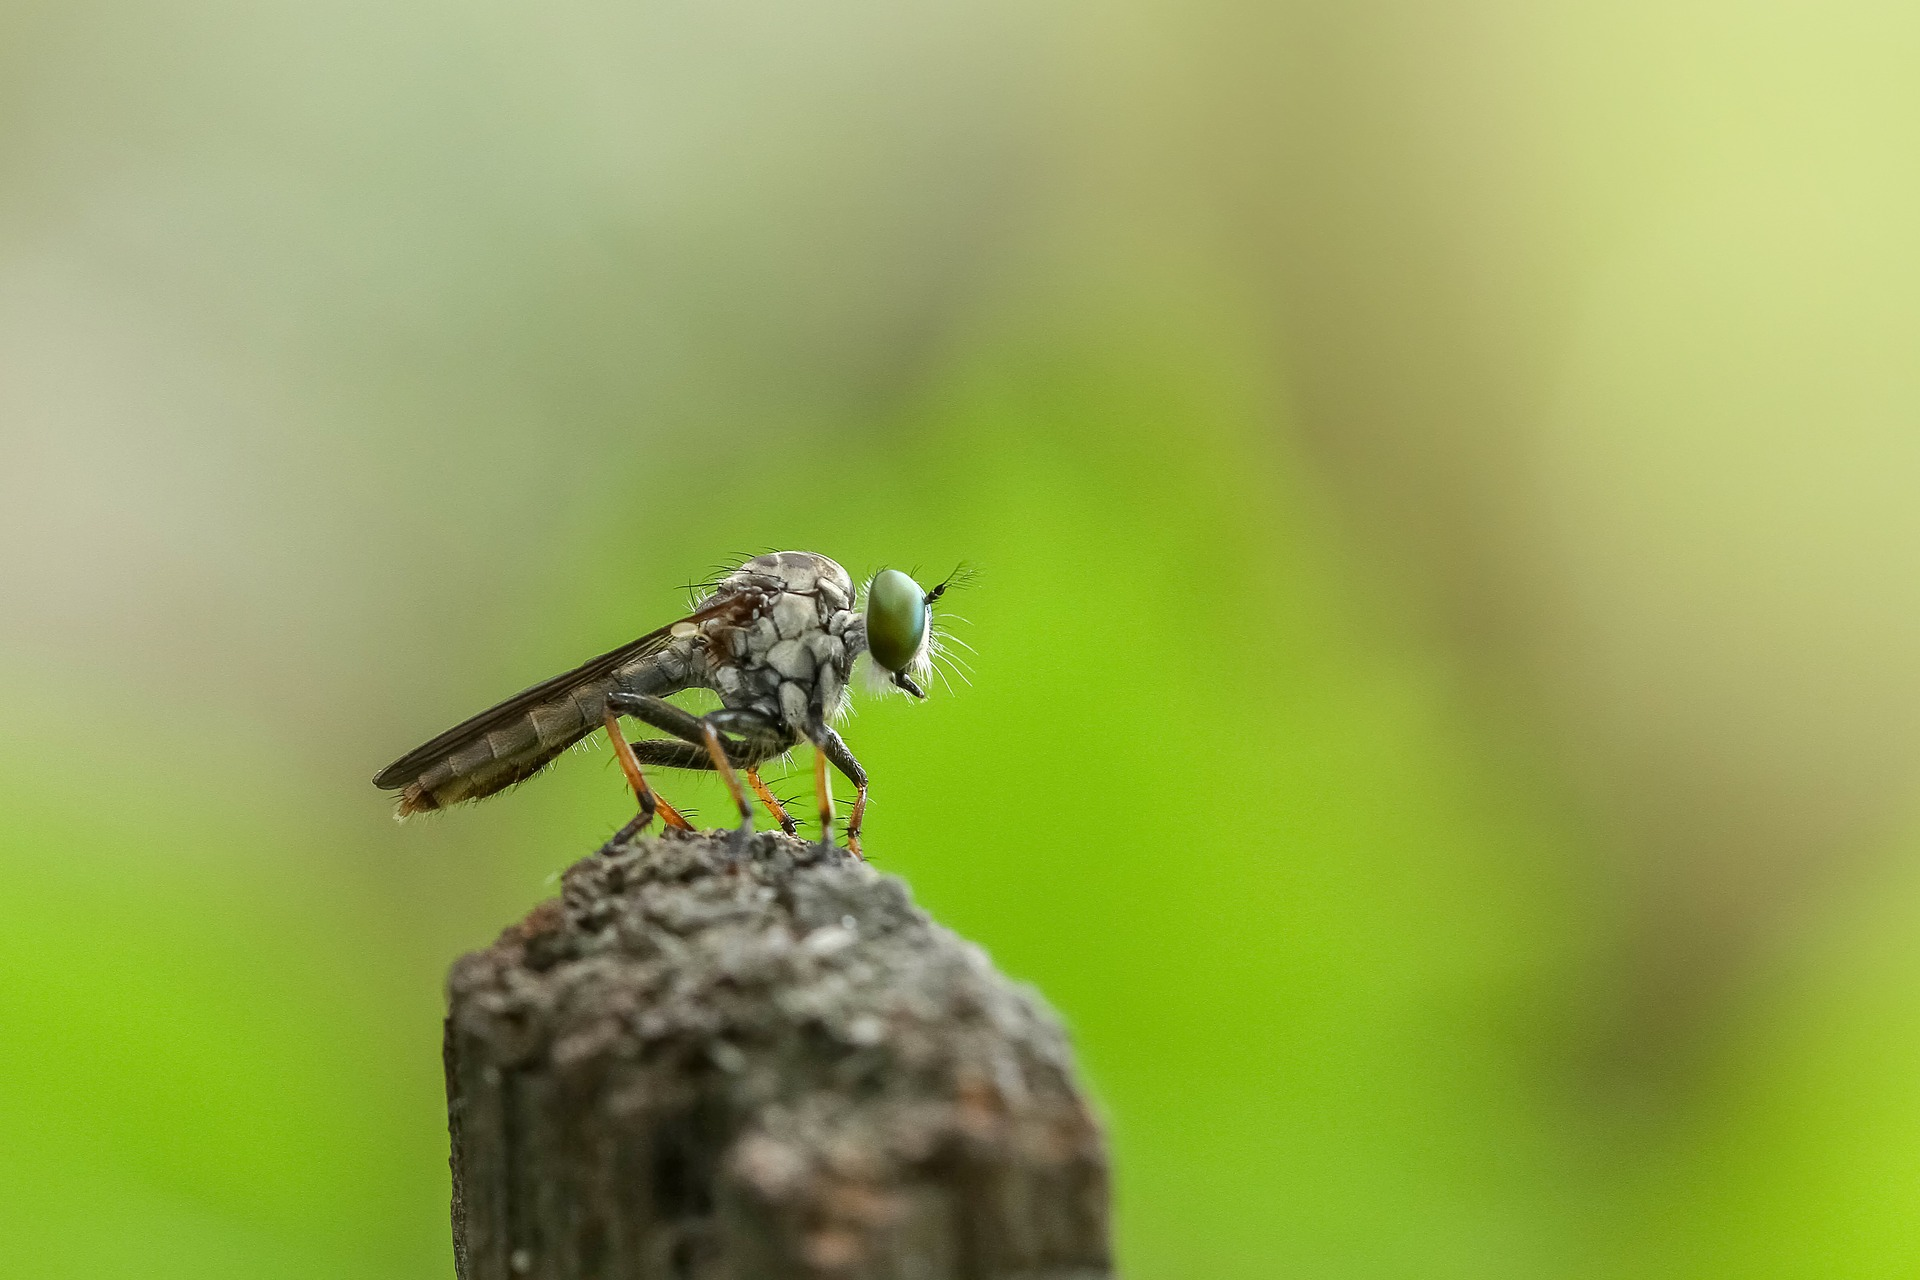 robberfly-1122508_1920